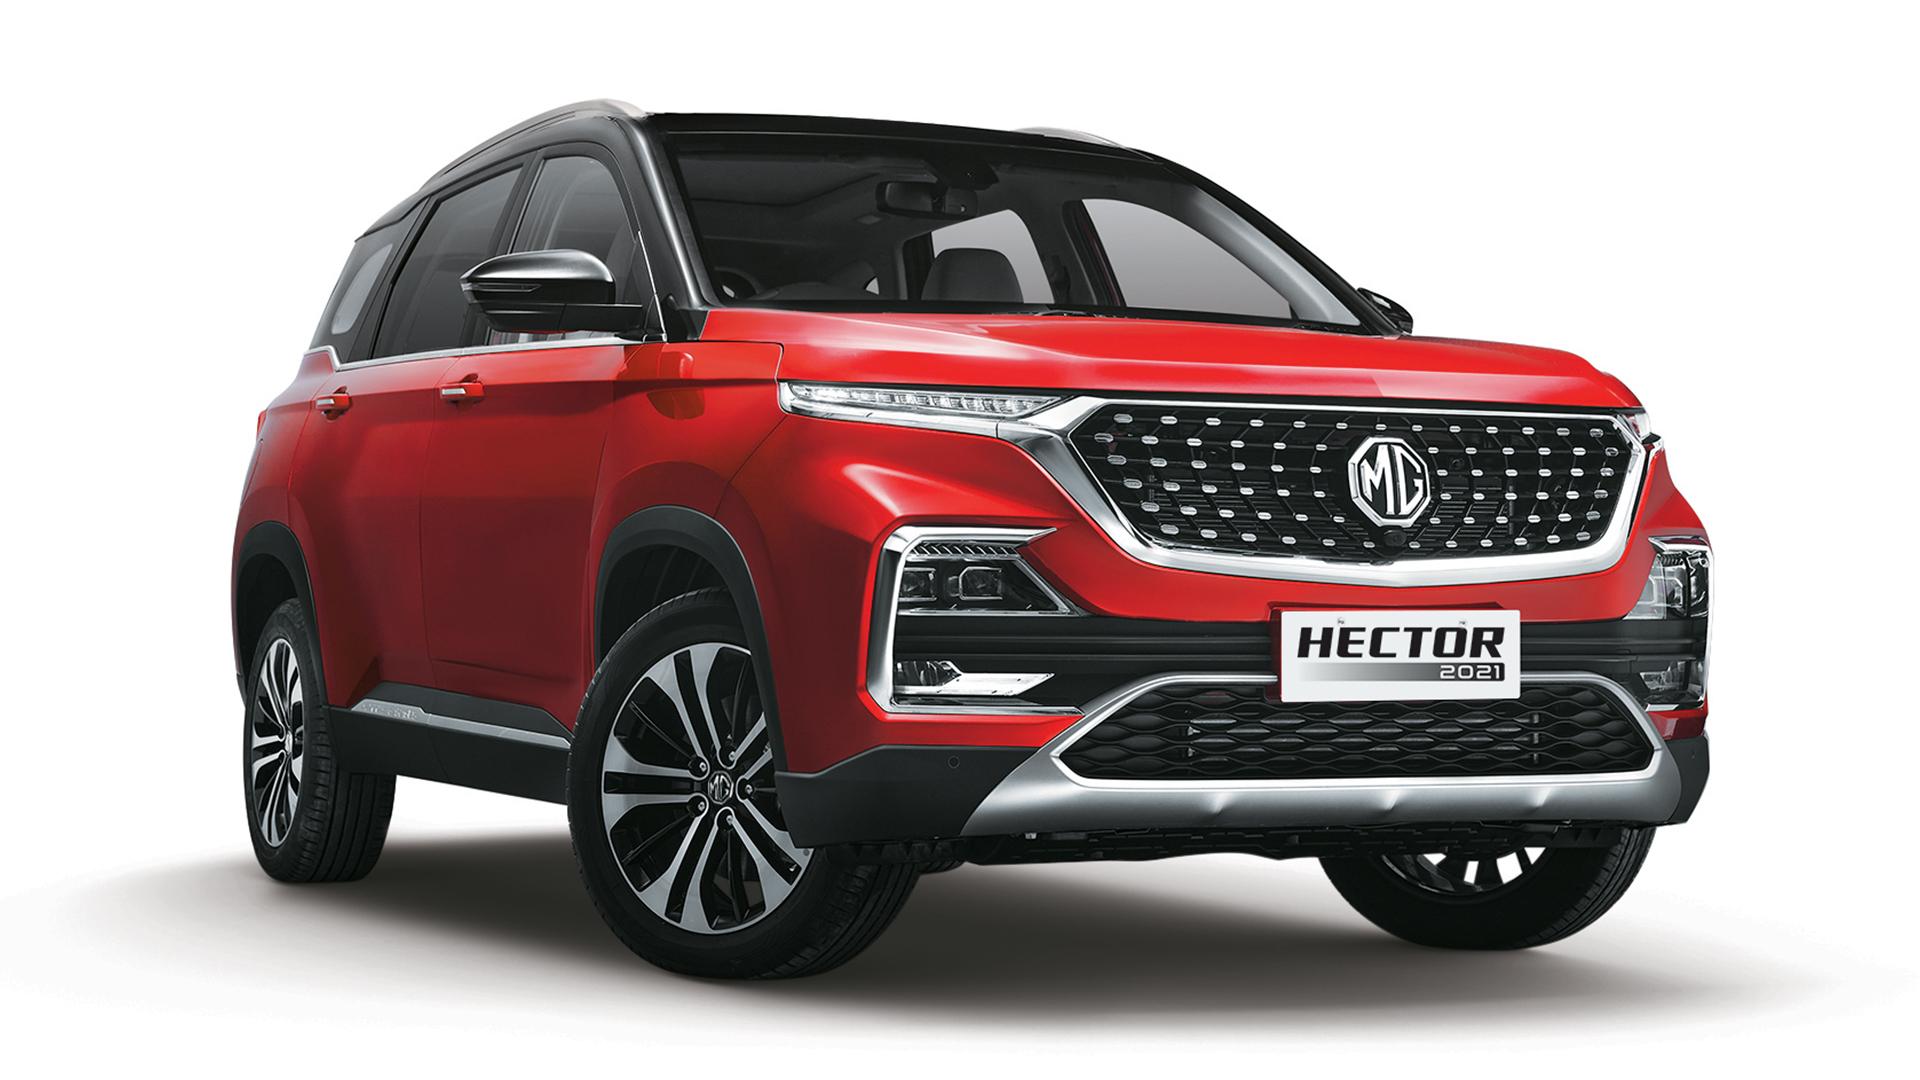 MG Hector 2021 2.0 Smart Diesel Exterior